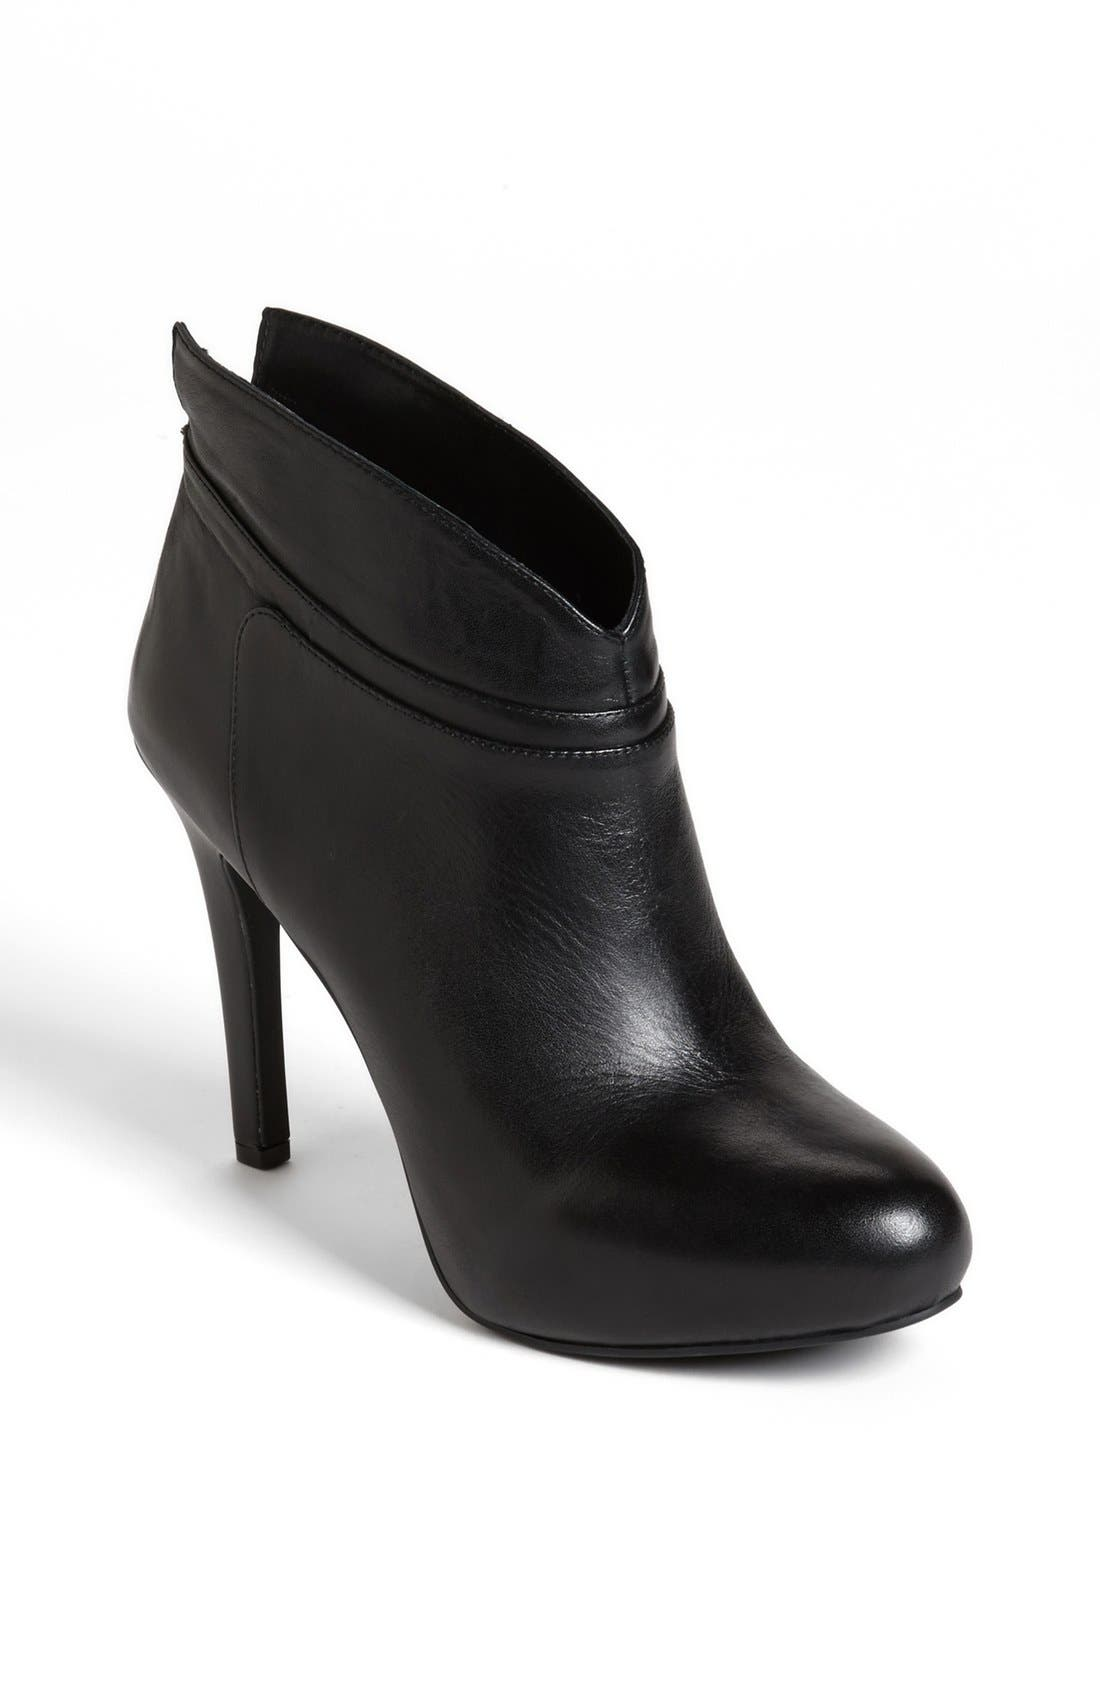 Main Image - Jessica Simpson 'Aggie' Boot